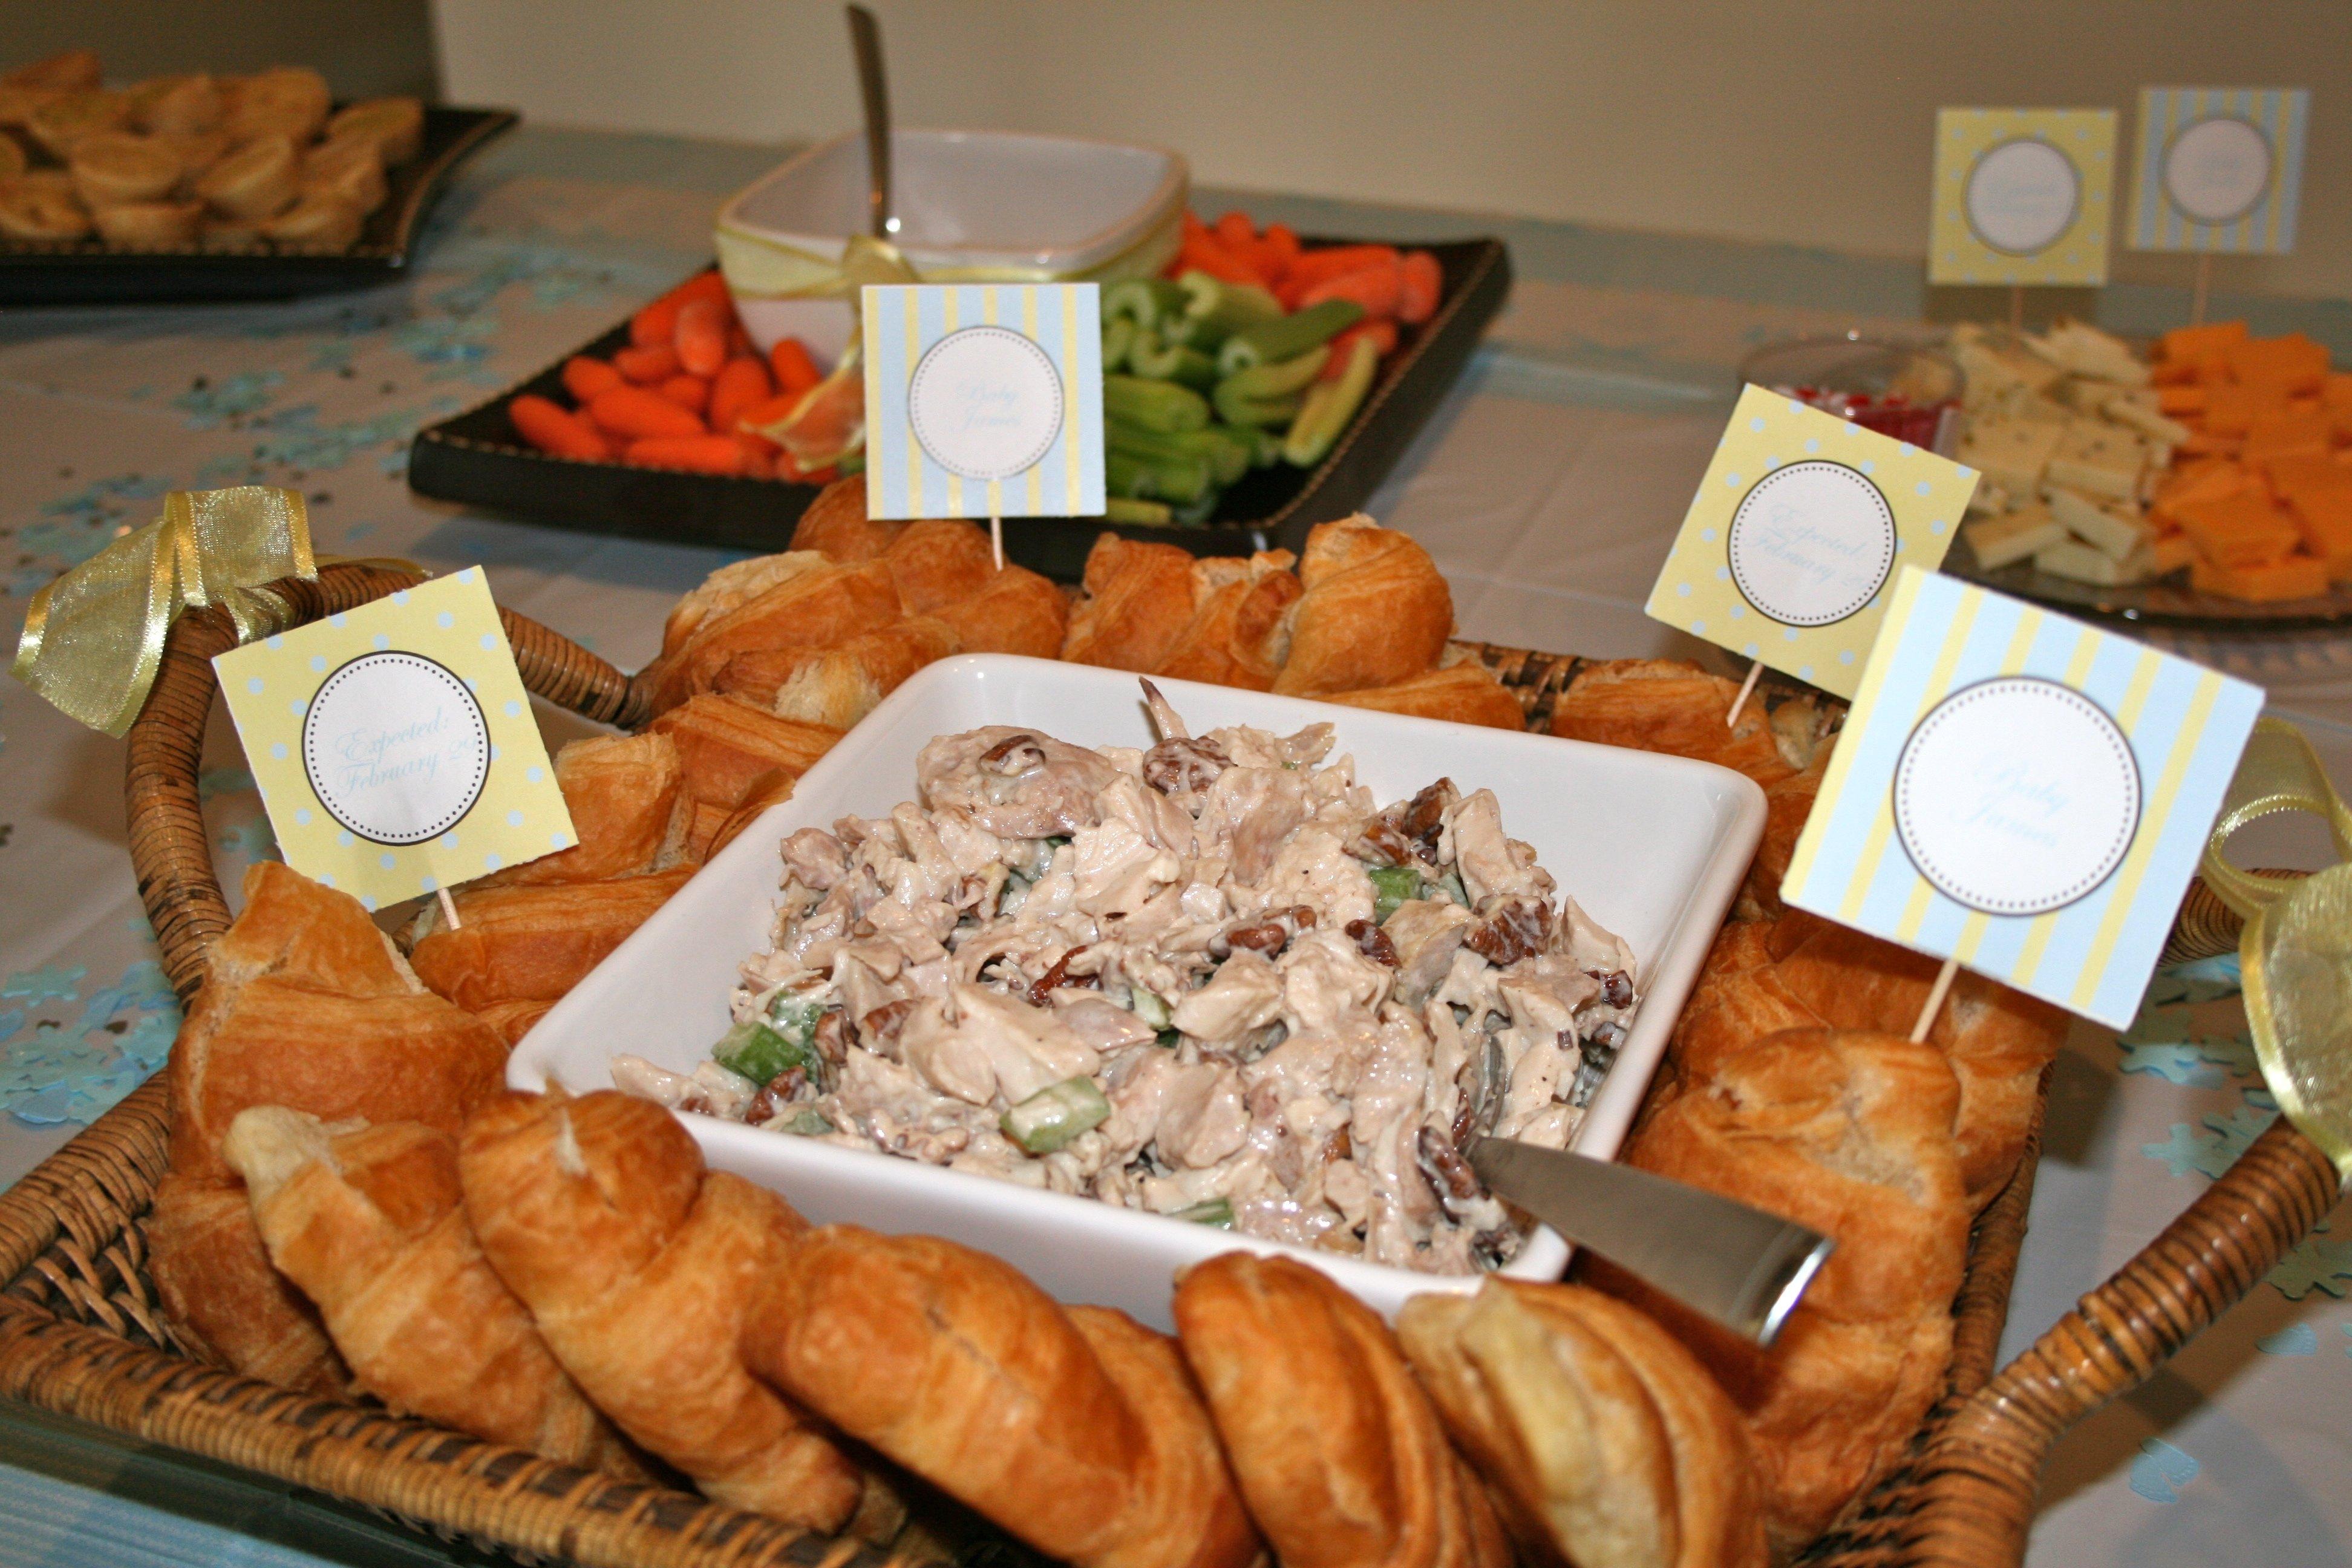 10 Stylish Baby Shower Food Menu Ideas frightening baby showerood menu ideas recipesinger brunch network 2020